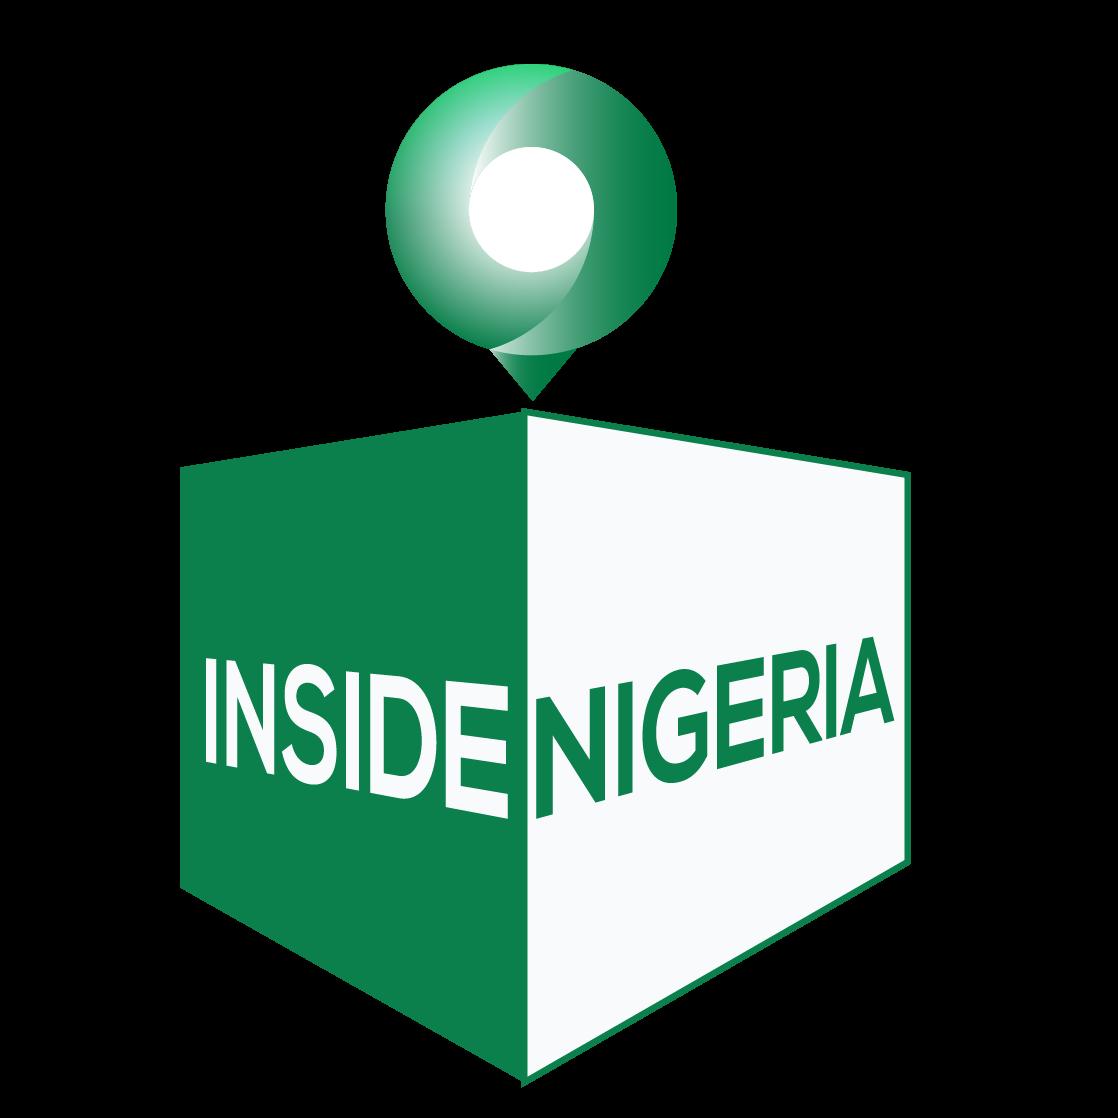 InsideNigeria